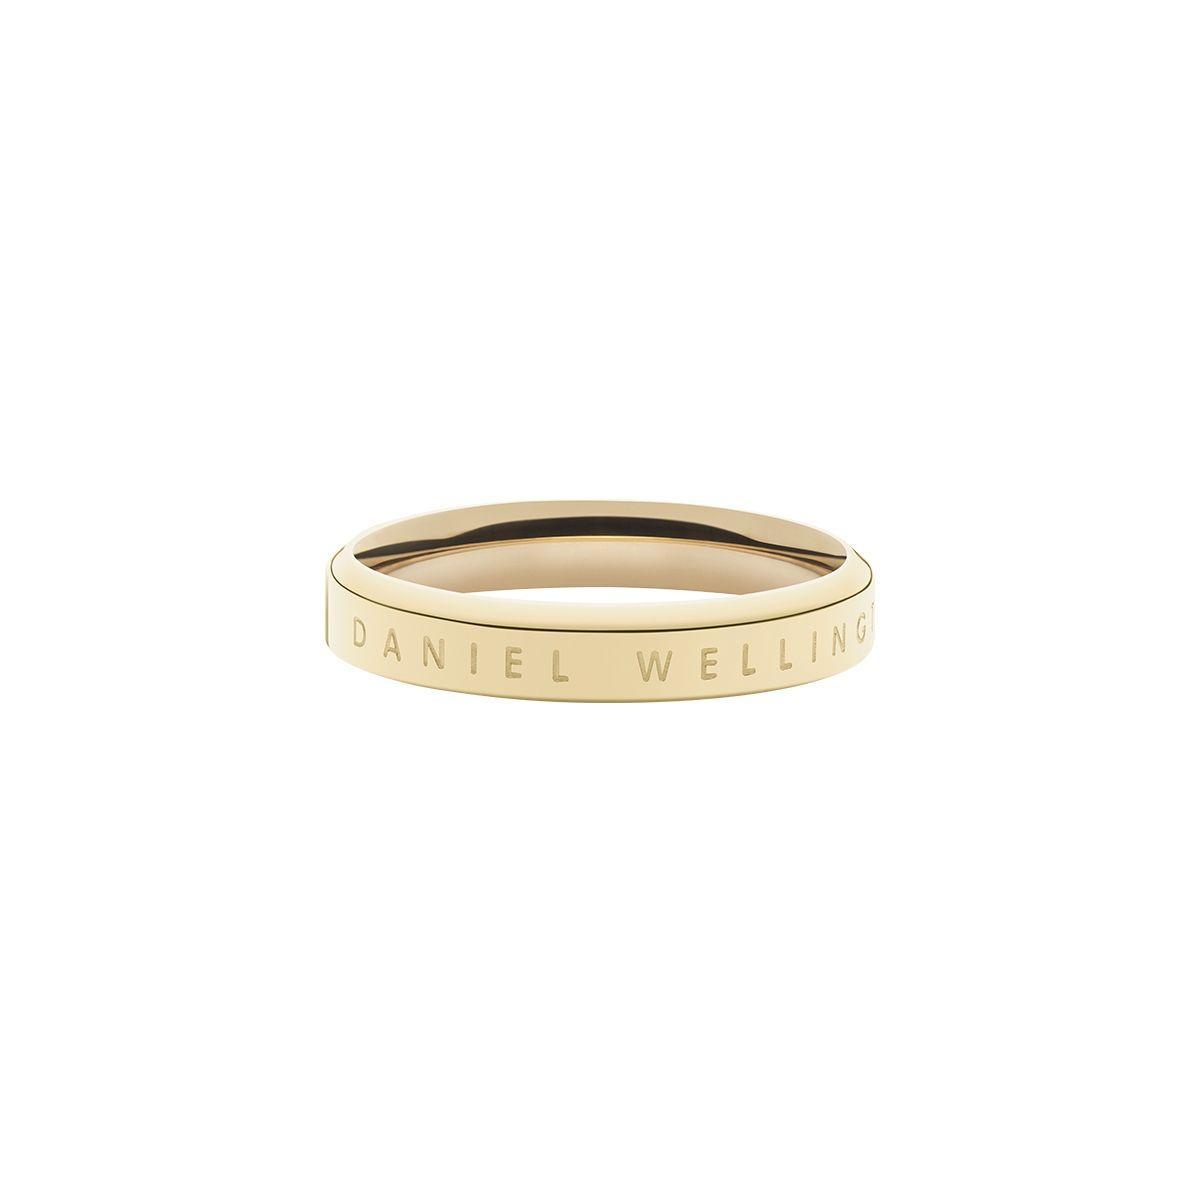 dw官网 dw手表官网 dw中国官网 dw官方旗舰店 DW DW官网  Classic Ring Gold 64 mm